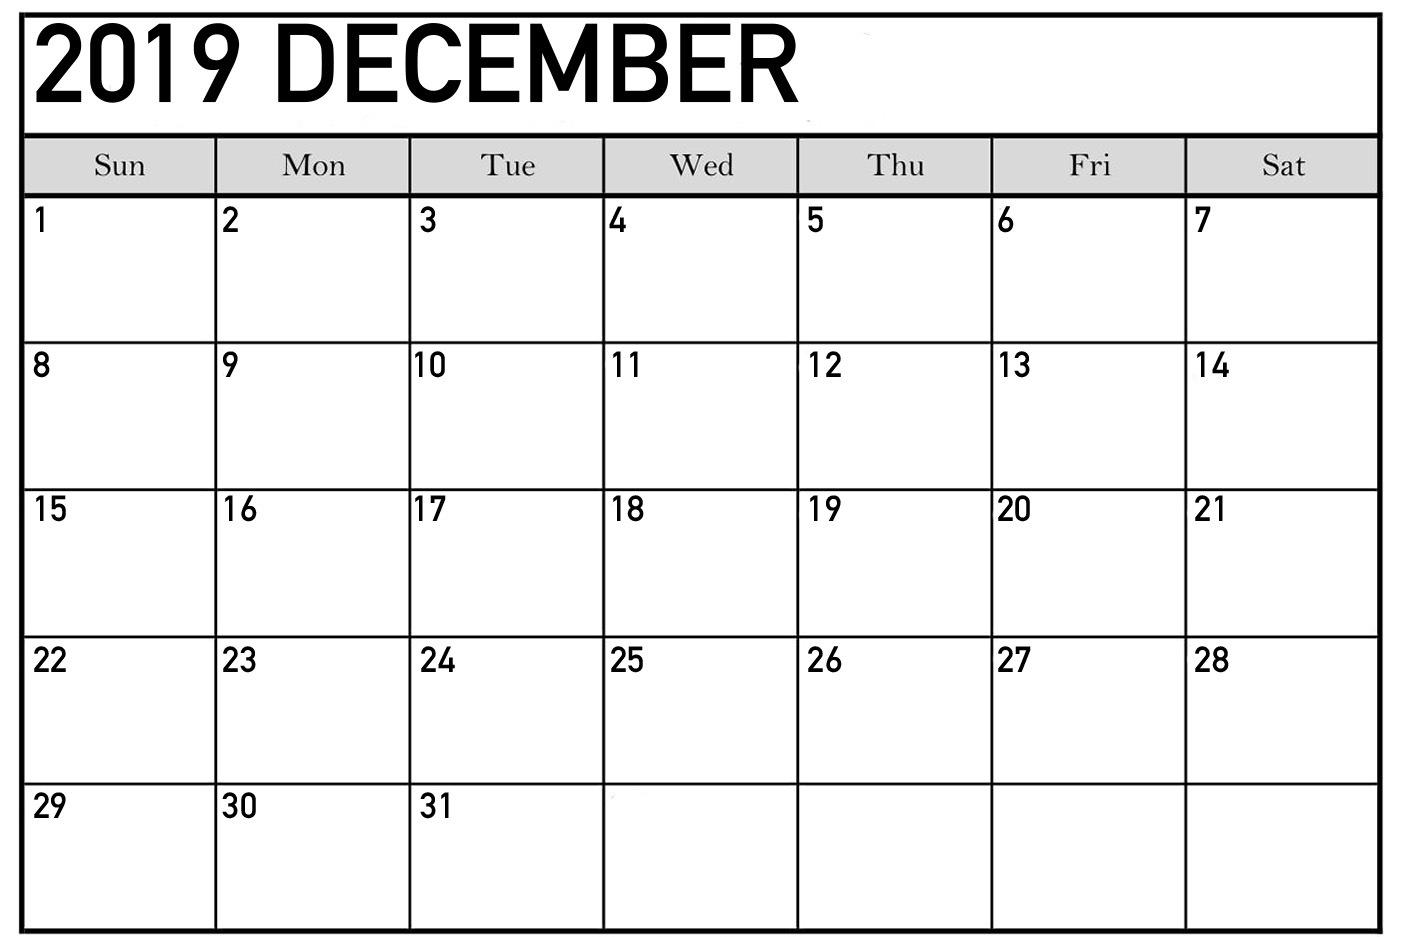 December 2019 Calendar Printable Cute